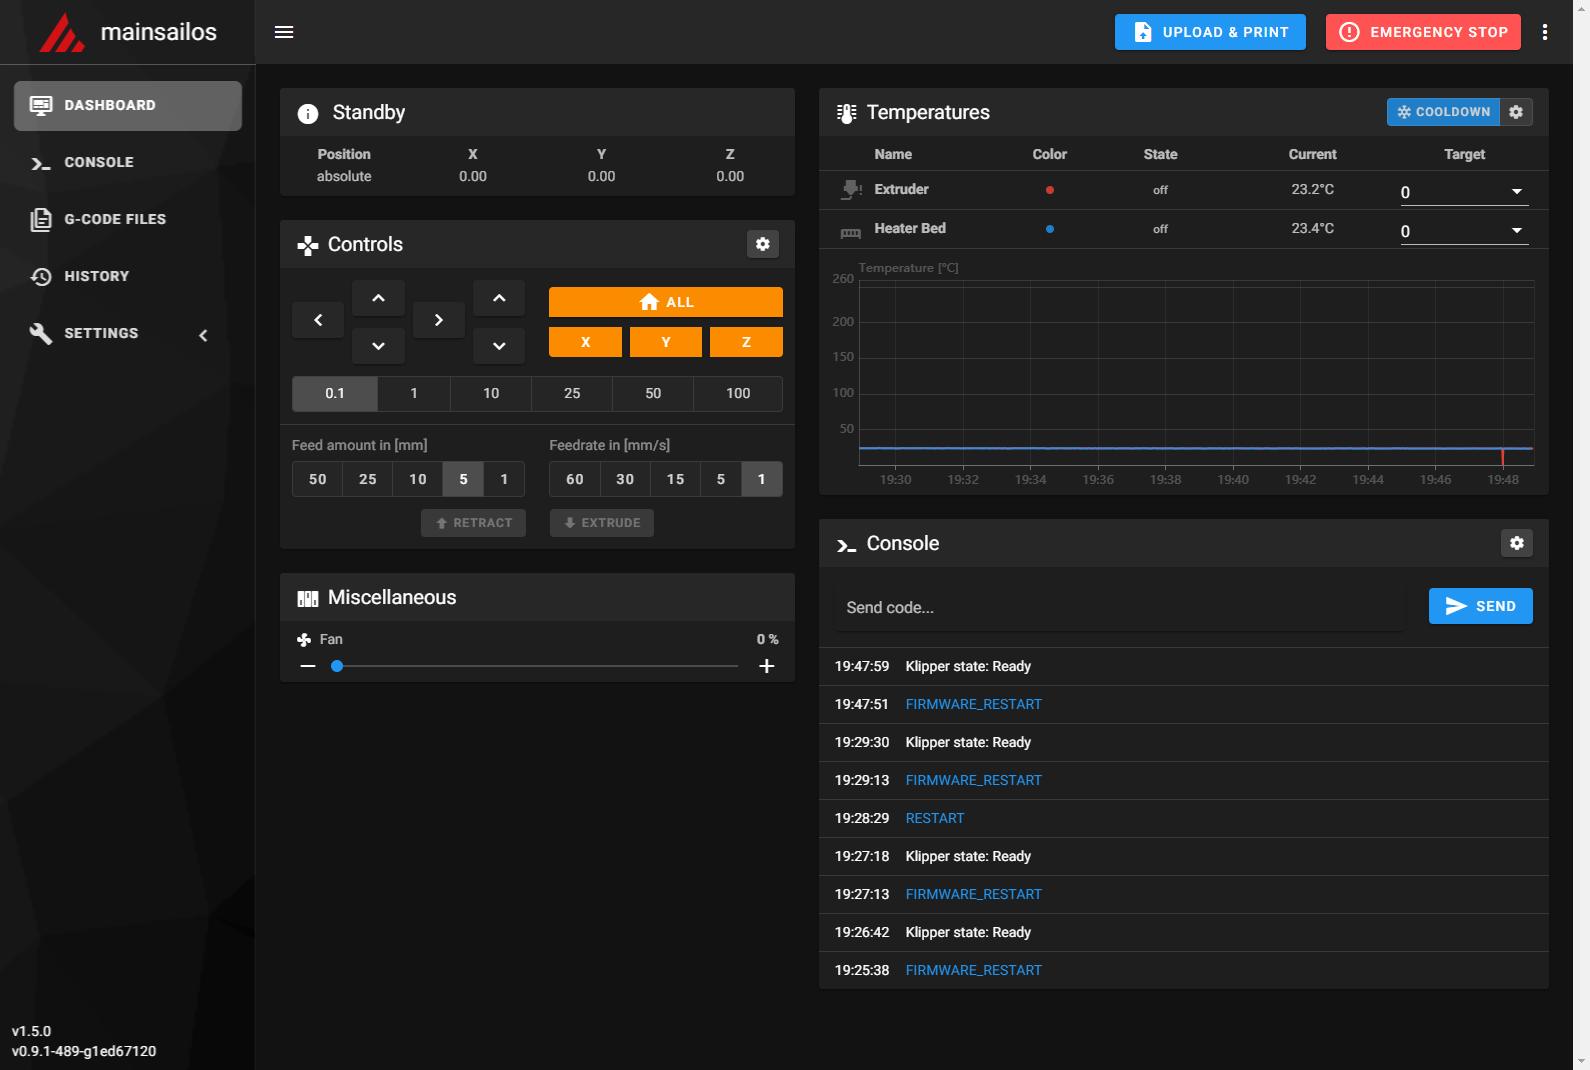 【3Dプリンタ】Ender-3 ProにKlipperファームウェアを導入した – MainsailOS編